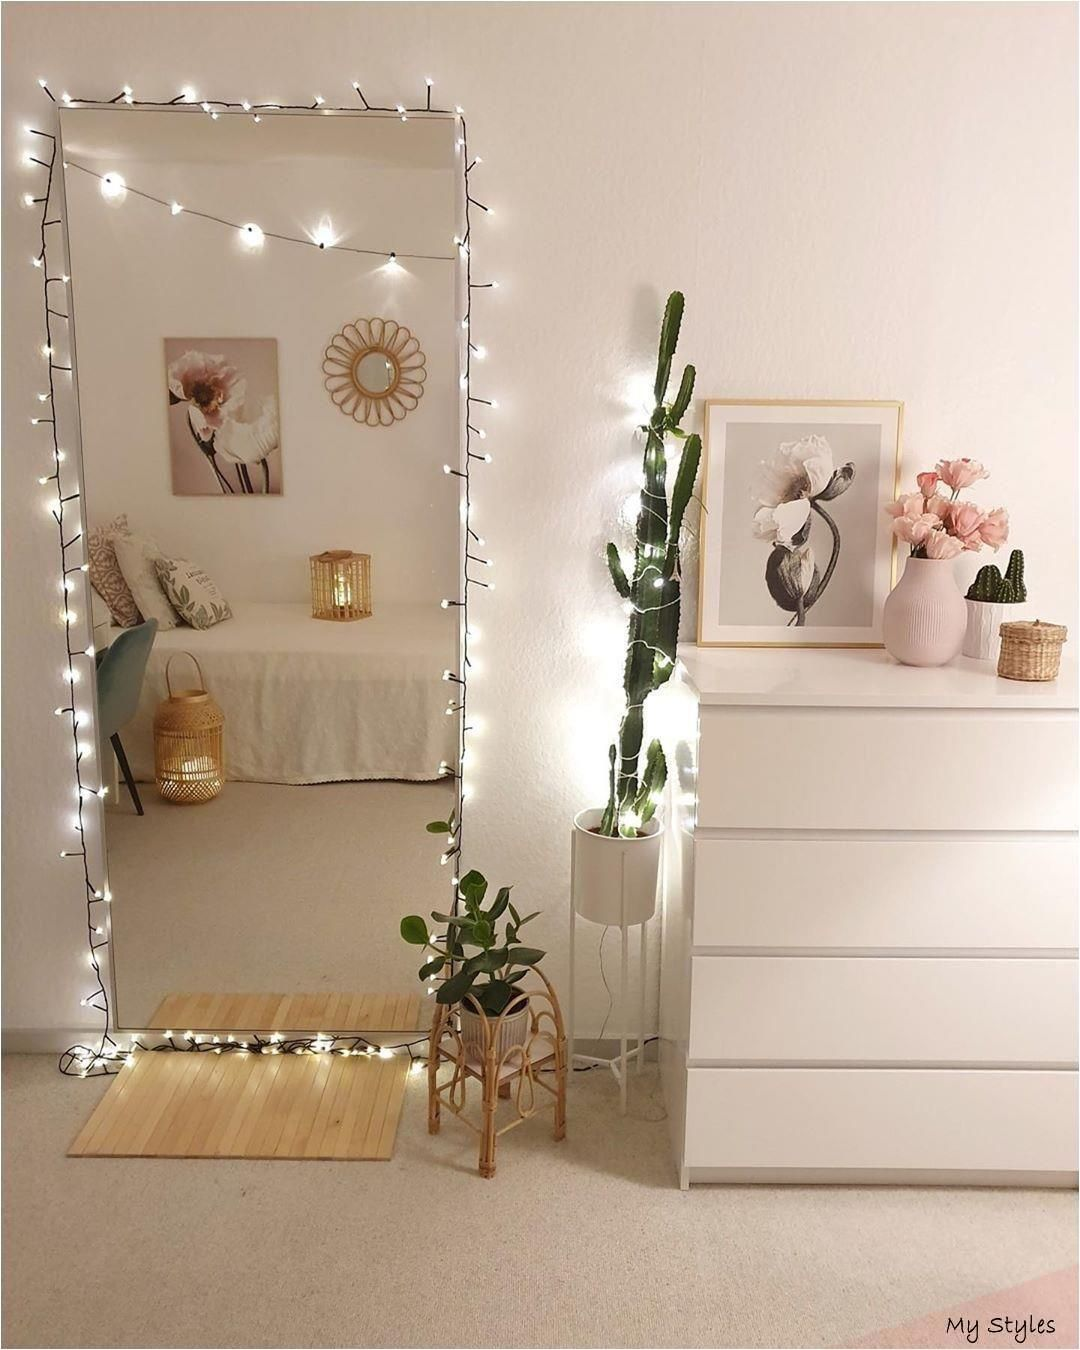 Home Decor Inspiration A A A On Instagram A A A Via My Homely Decor A A A Venster Modellen In 2020 Aesthetic Room Decor Room Decor Girl Bedroom Decor